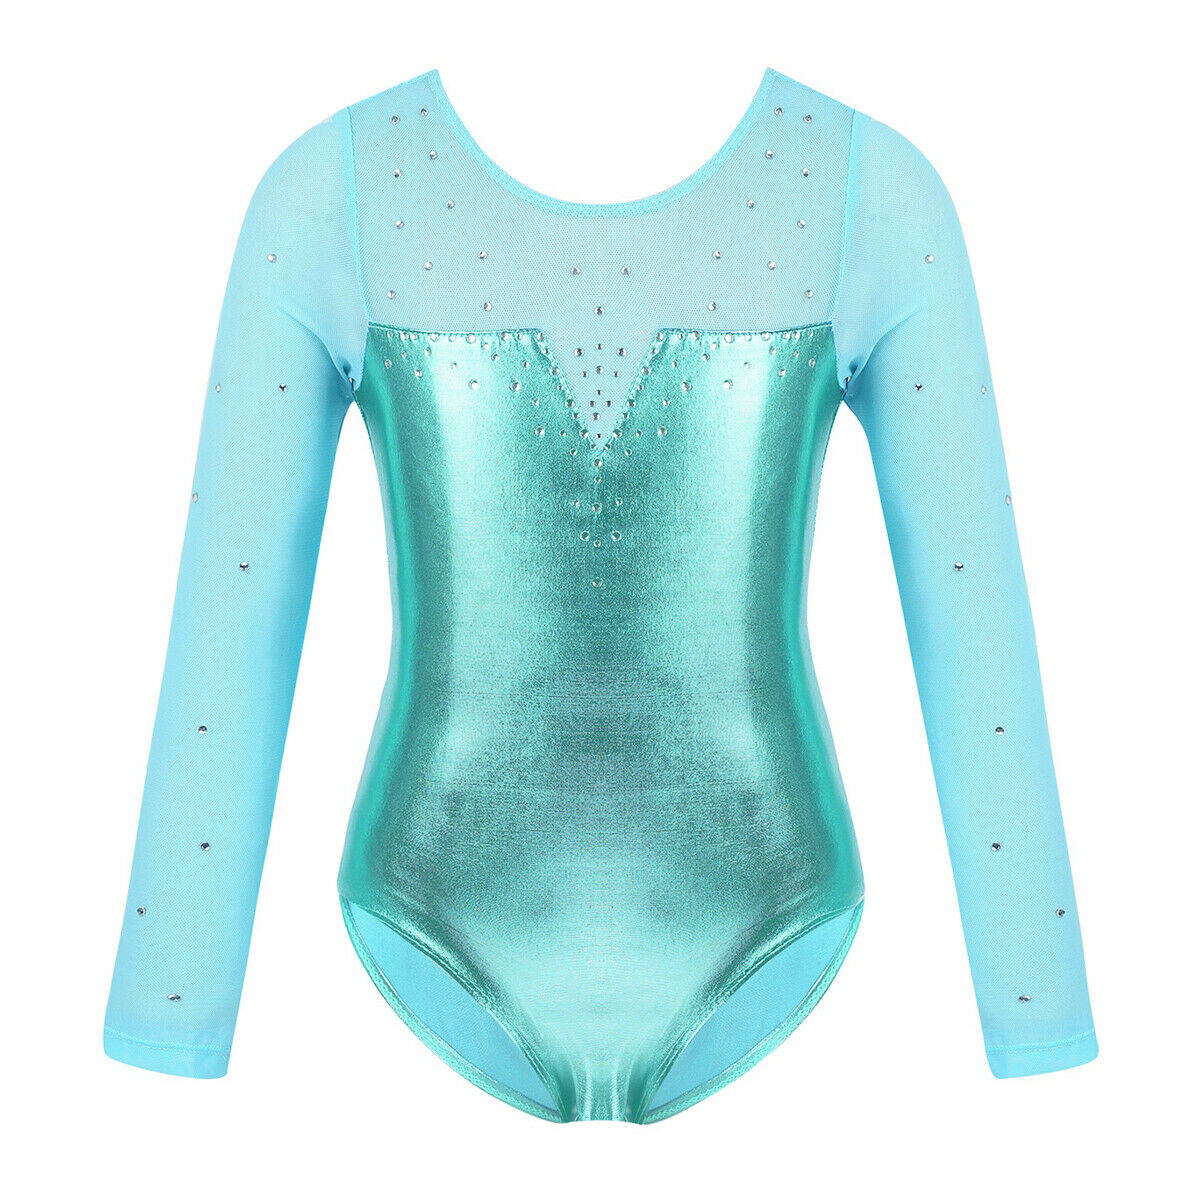 Girls Ballet Dance Leotards Gymnastics Shiny Long Sleeve Jumpsuit Bodysuit 3-14Y